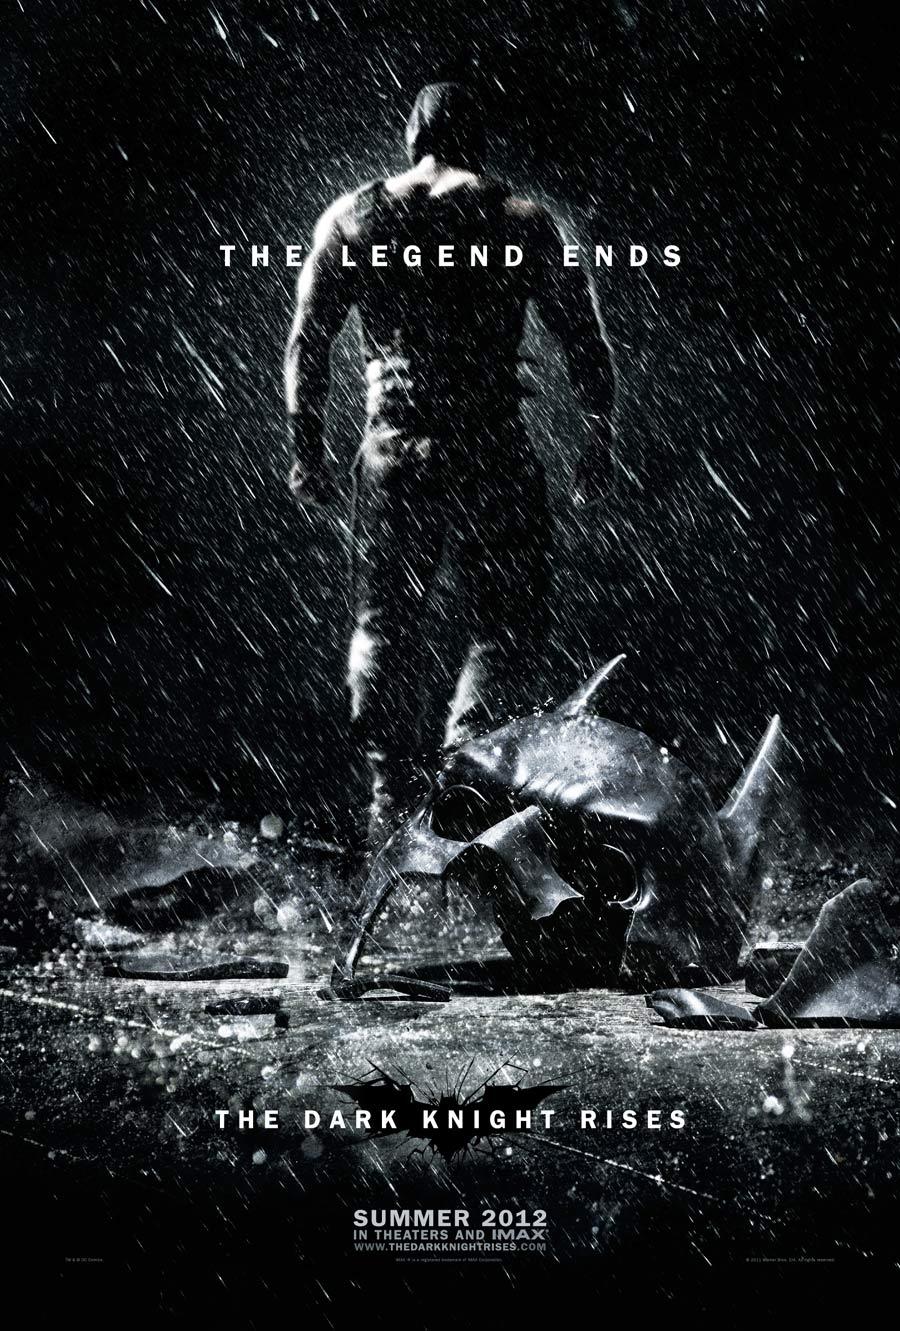 The Dark Knight Rises Nightwing Badge